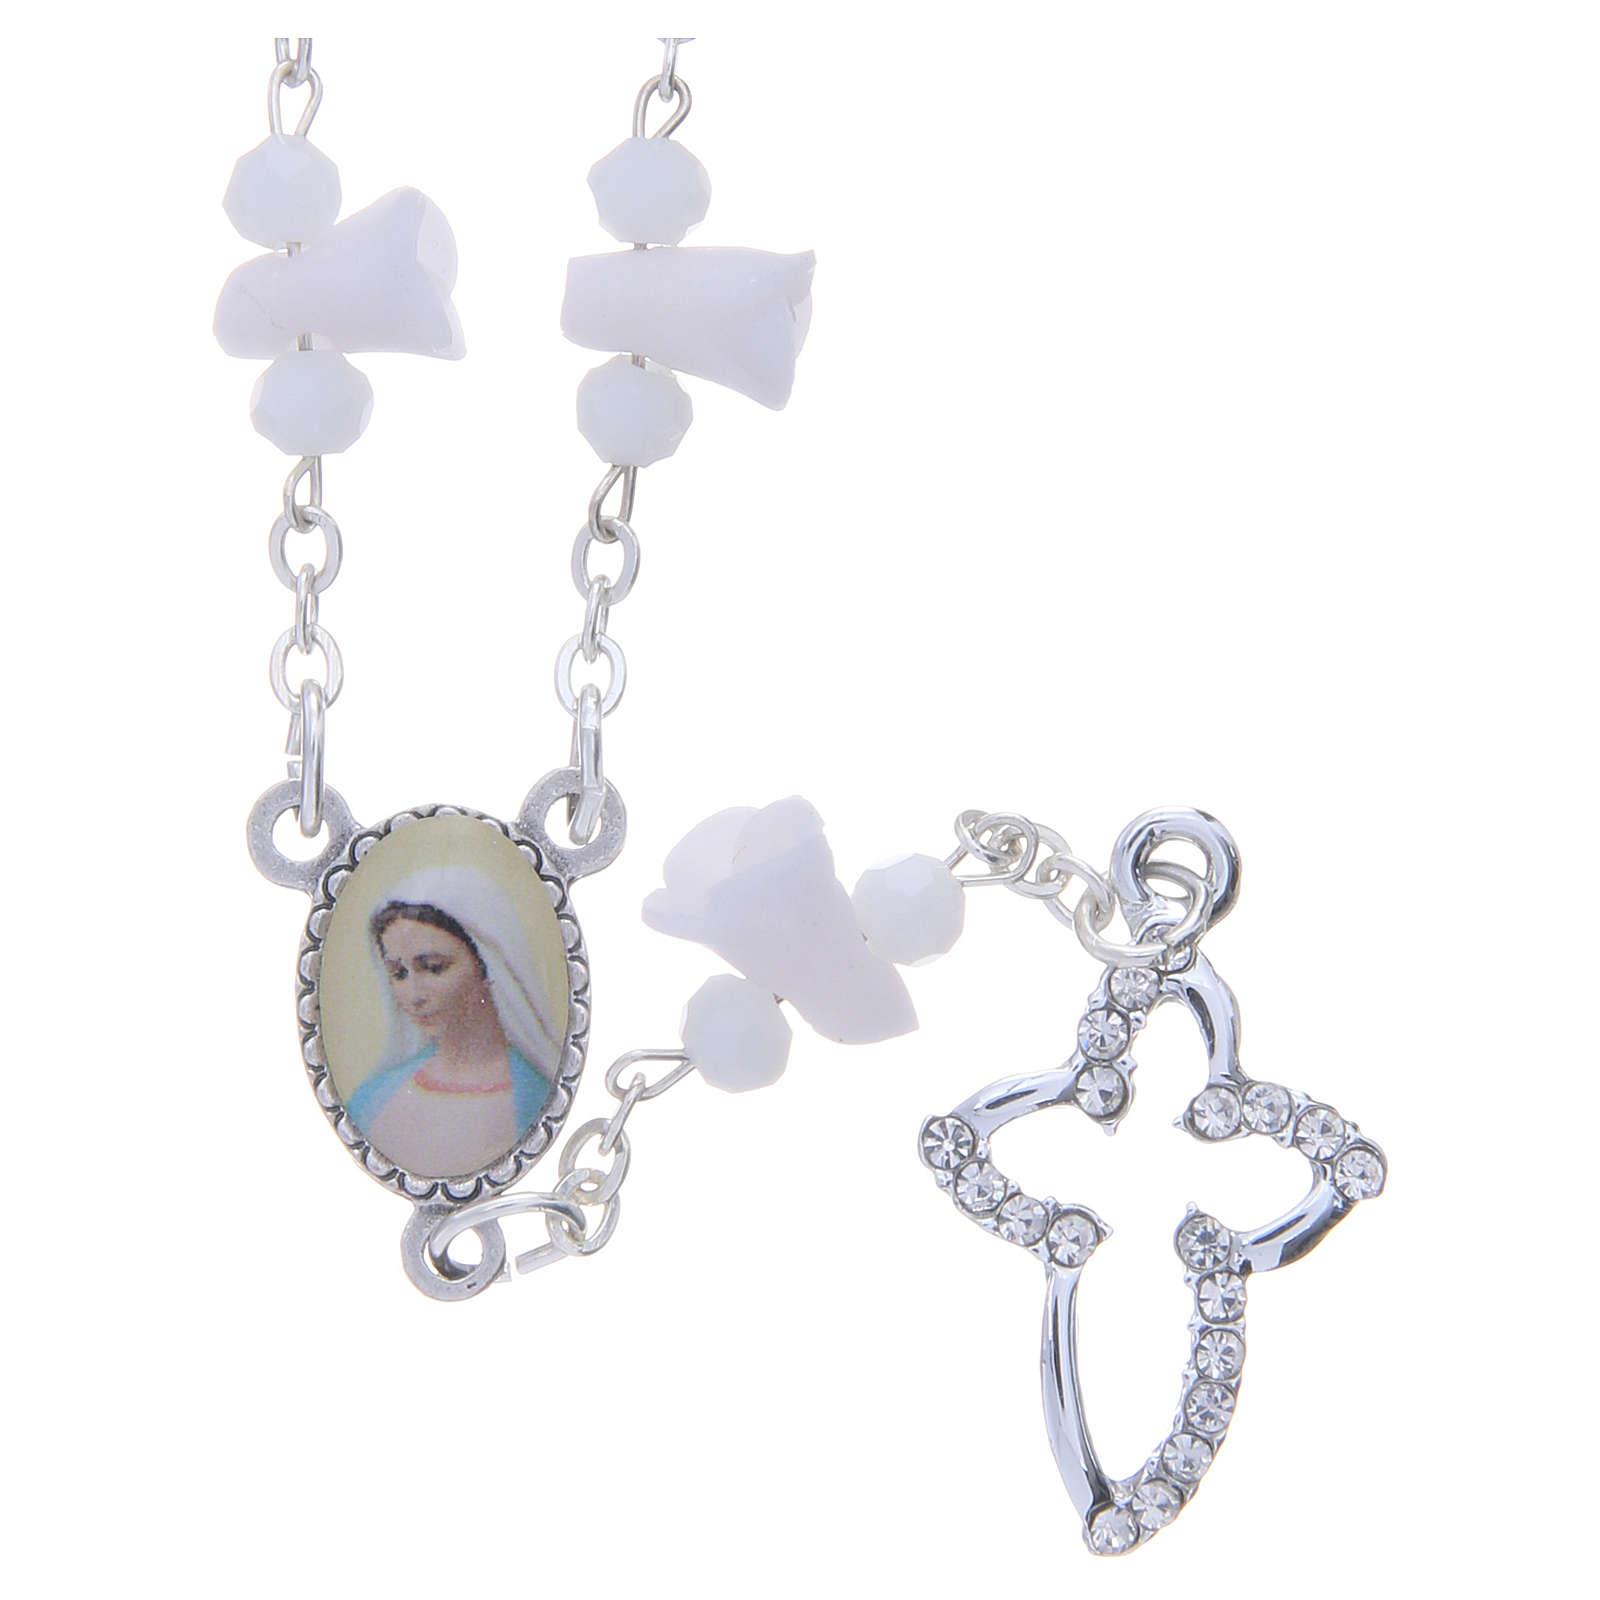 Collana rosario Medjugorje rose bianche ceramica icona Madonna 4